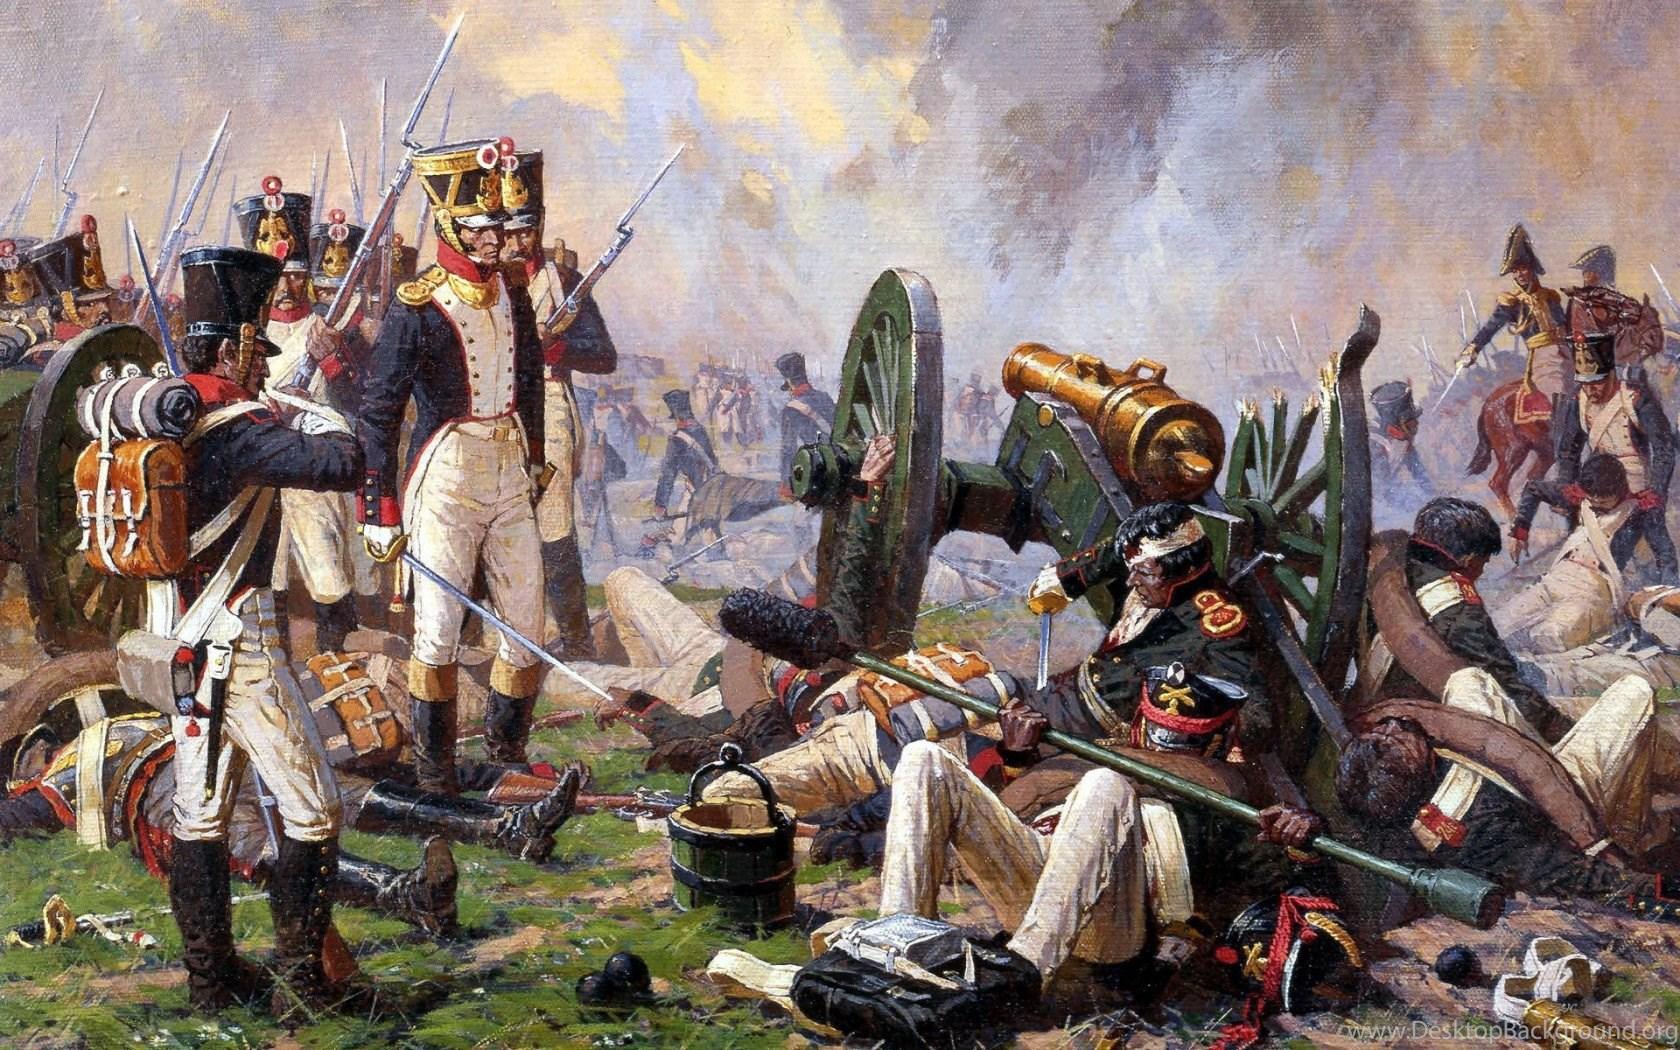 1049966_download-wallpapers-napoleon-artillerie-war-soldier-uniform_1680x1050_h.jpg